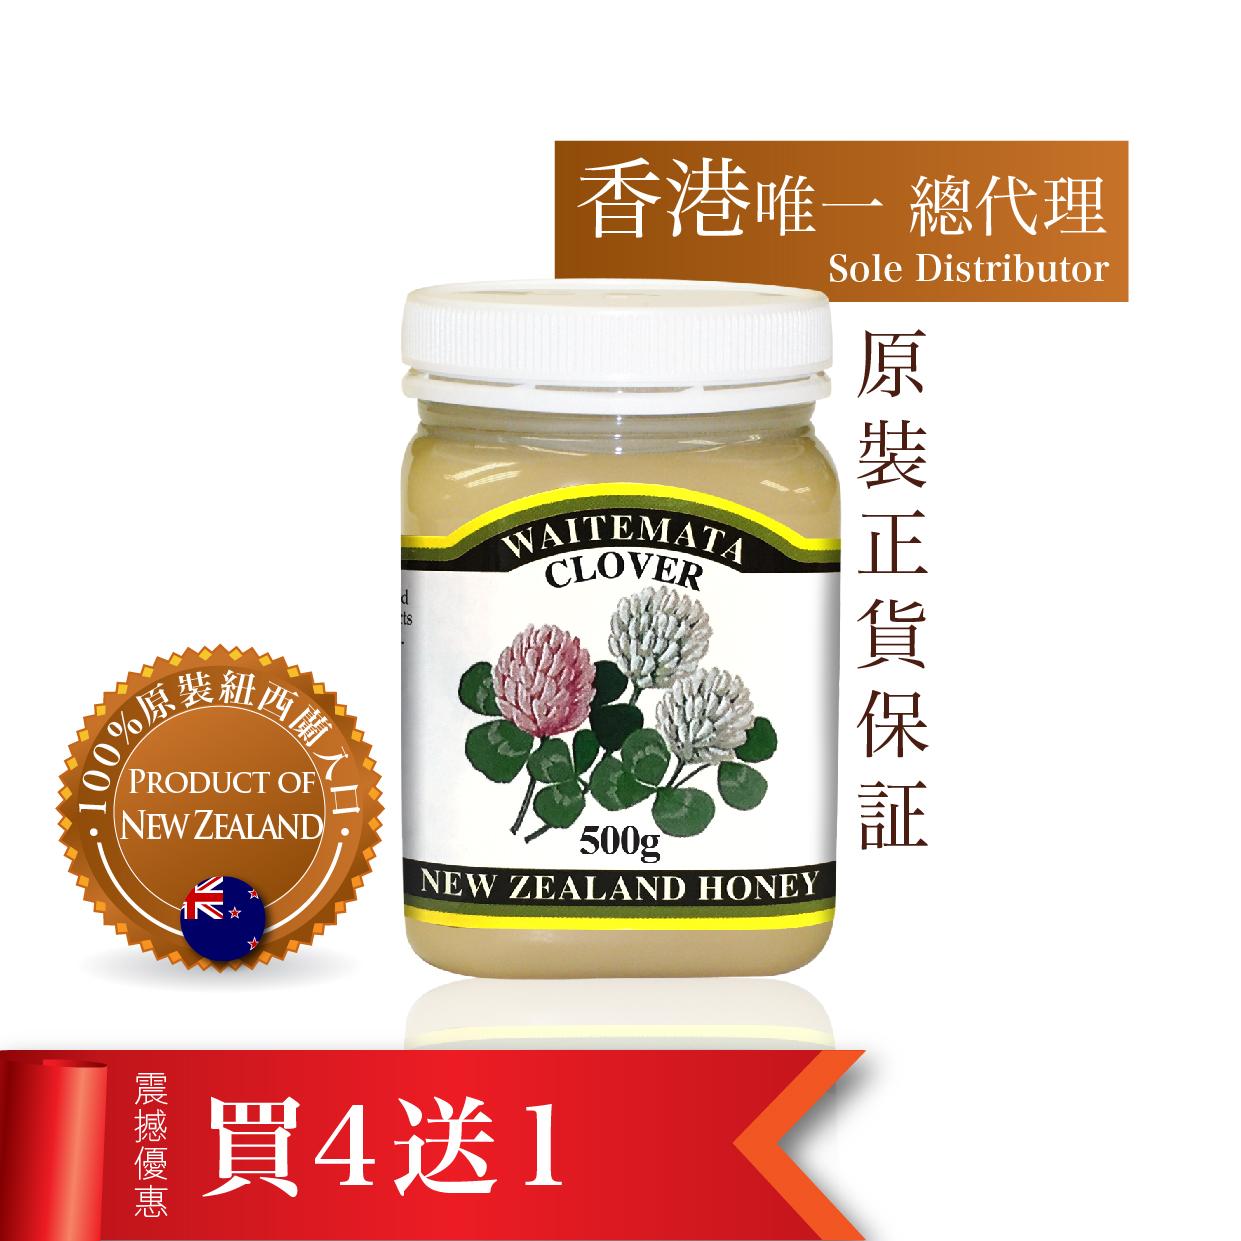 WIATEMATAClover Cream 500g